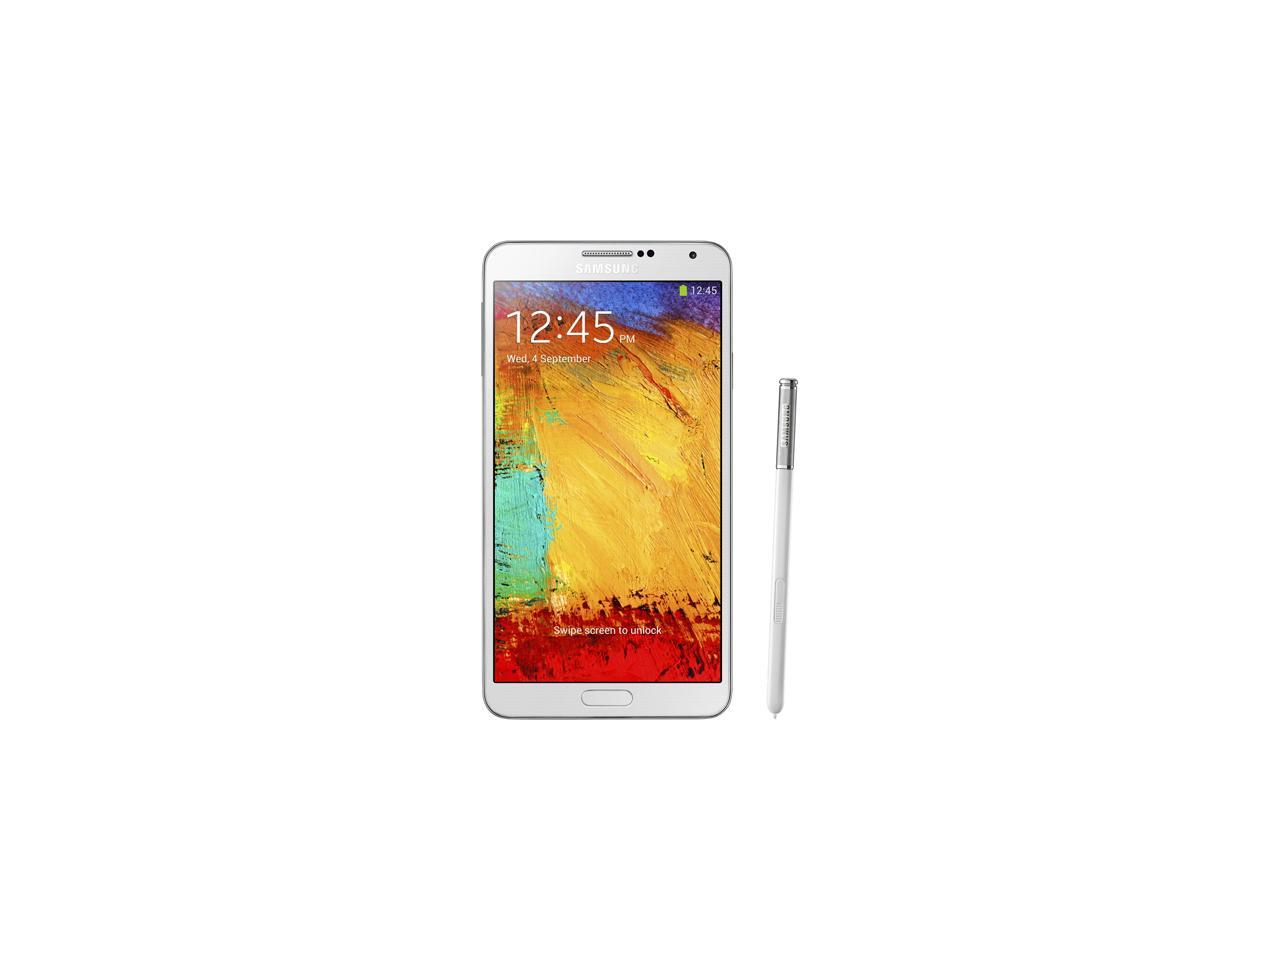 Samsung Galaxy Note 3 N900a 4g Lte 32gb Unlocked Gsm Celll Phone 5 7 White 32gb 3gb Ram Newegg Com